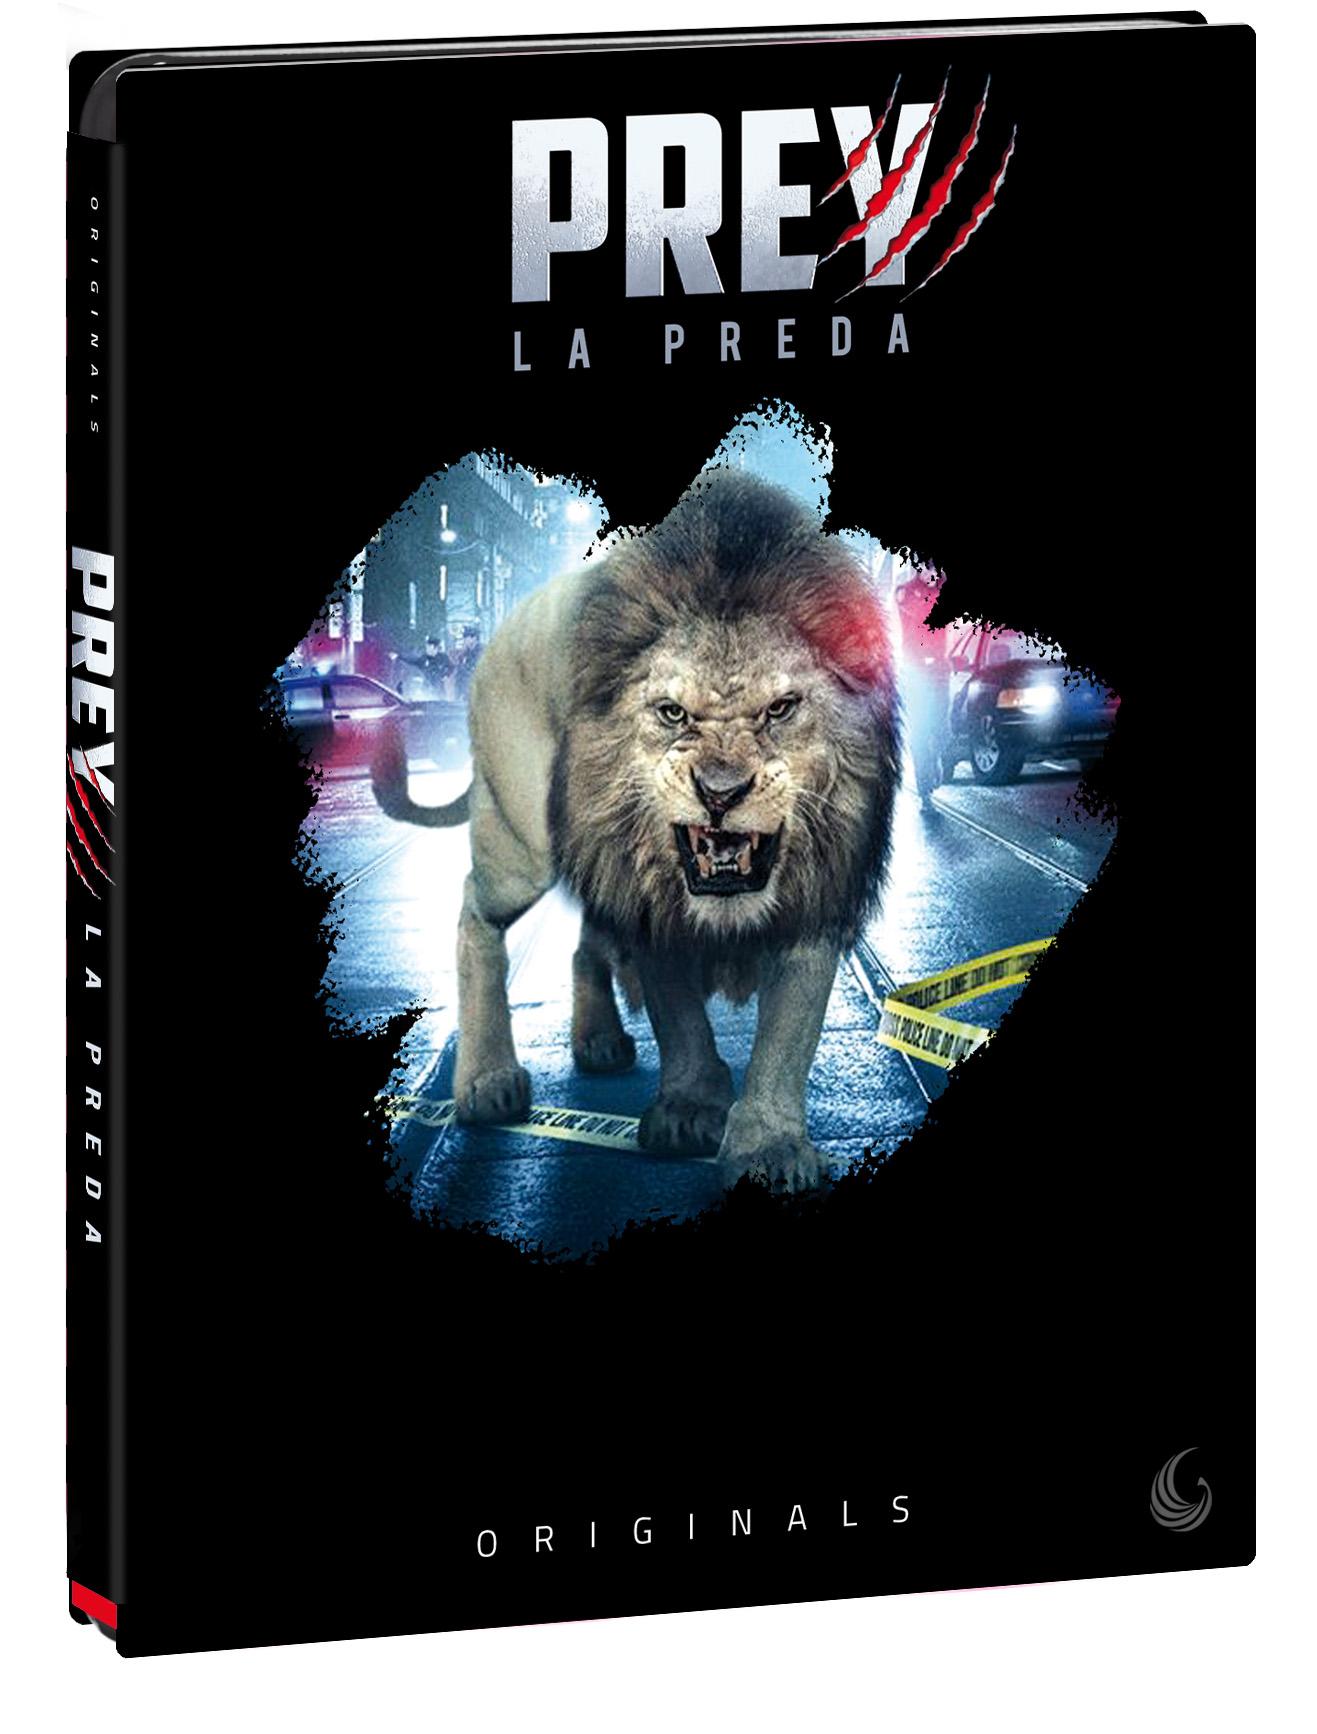 PREY - LA PREDA (BLU-RAY+DVD)